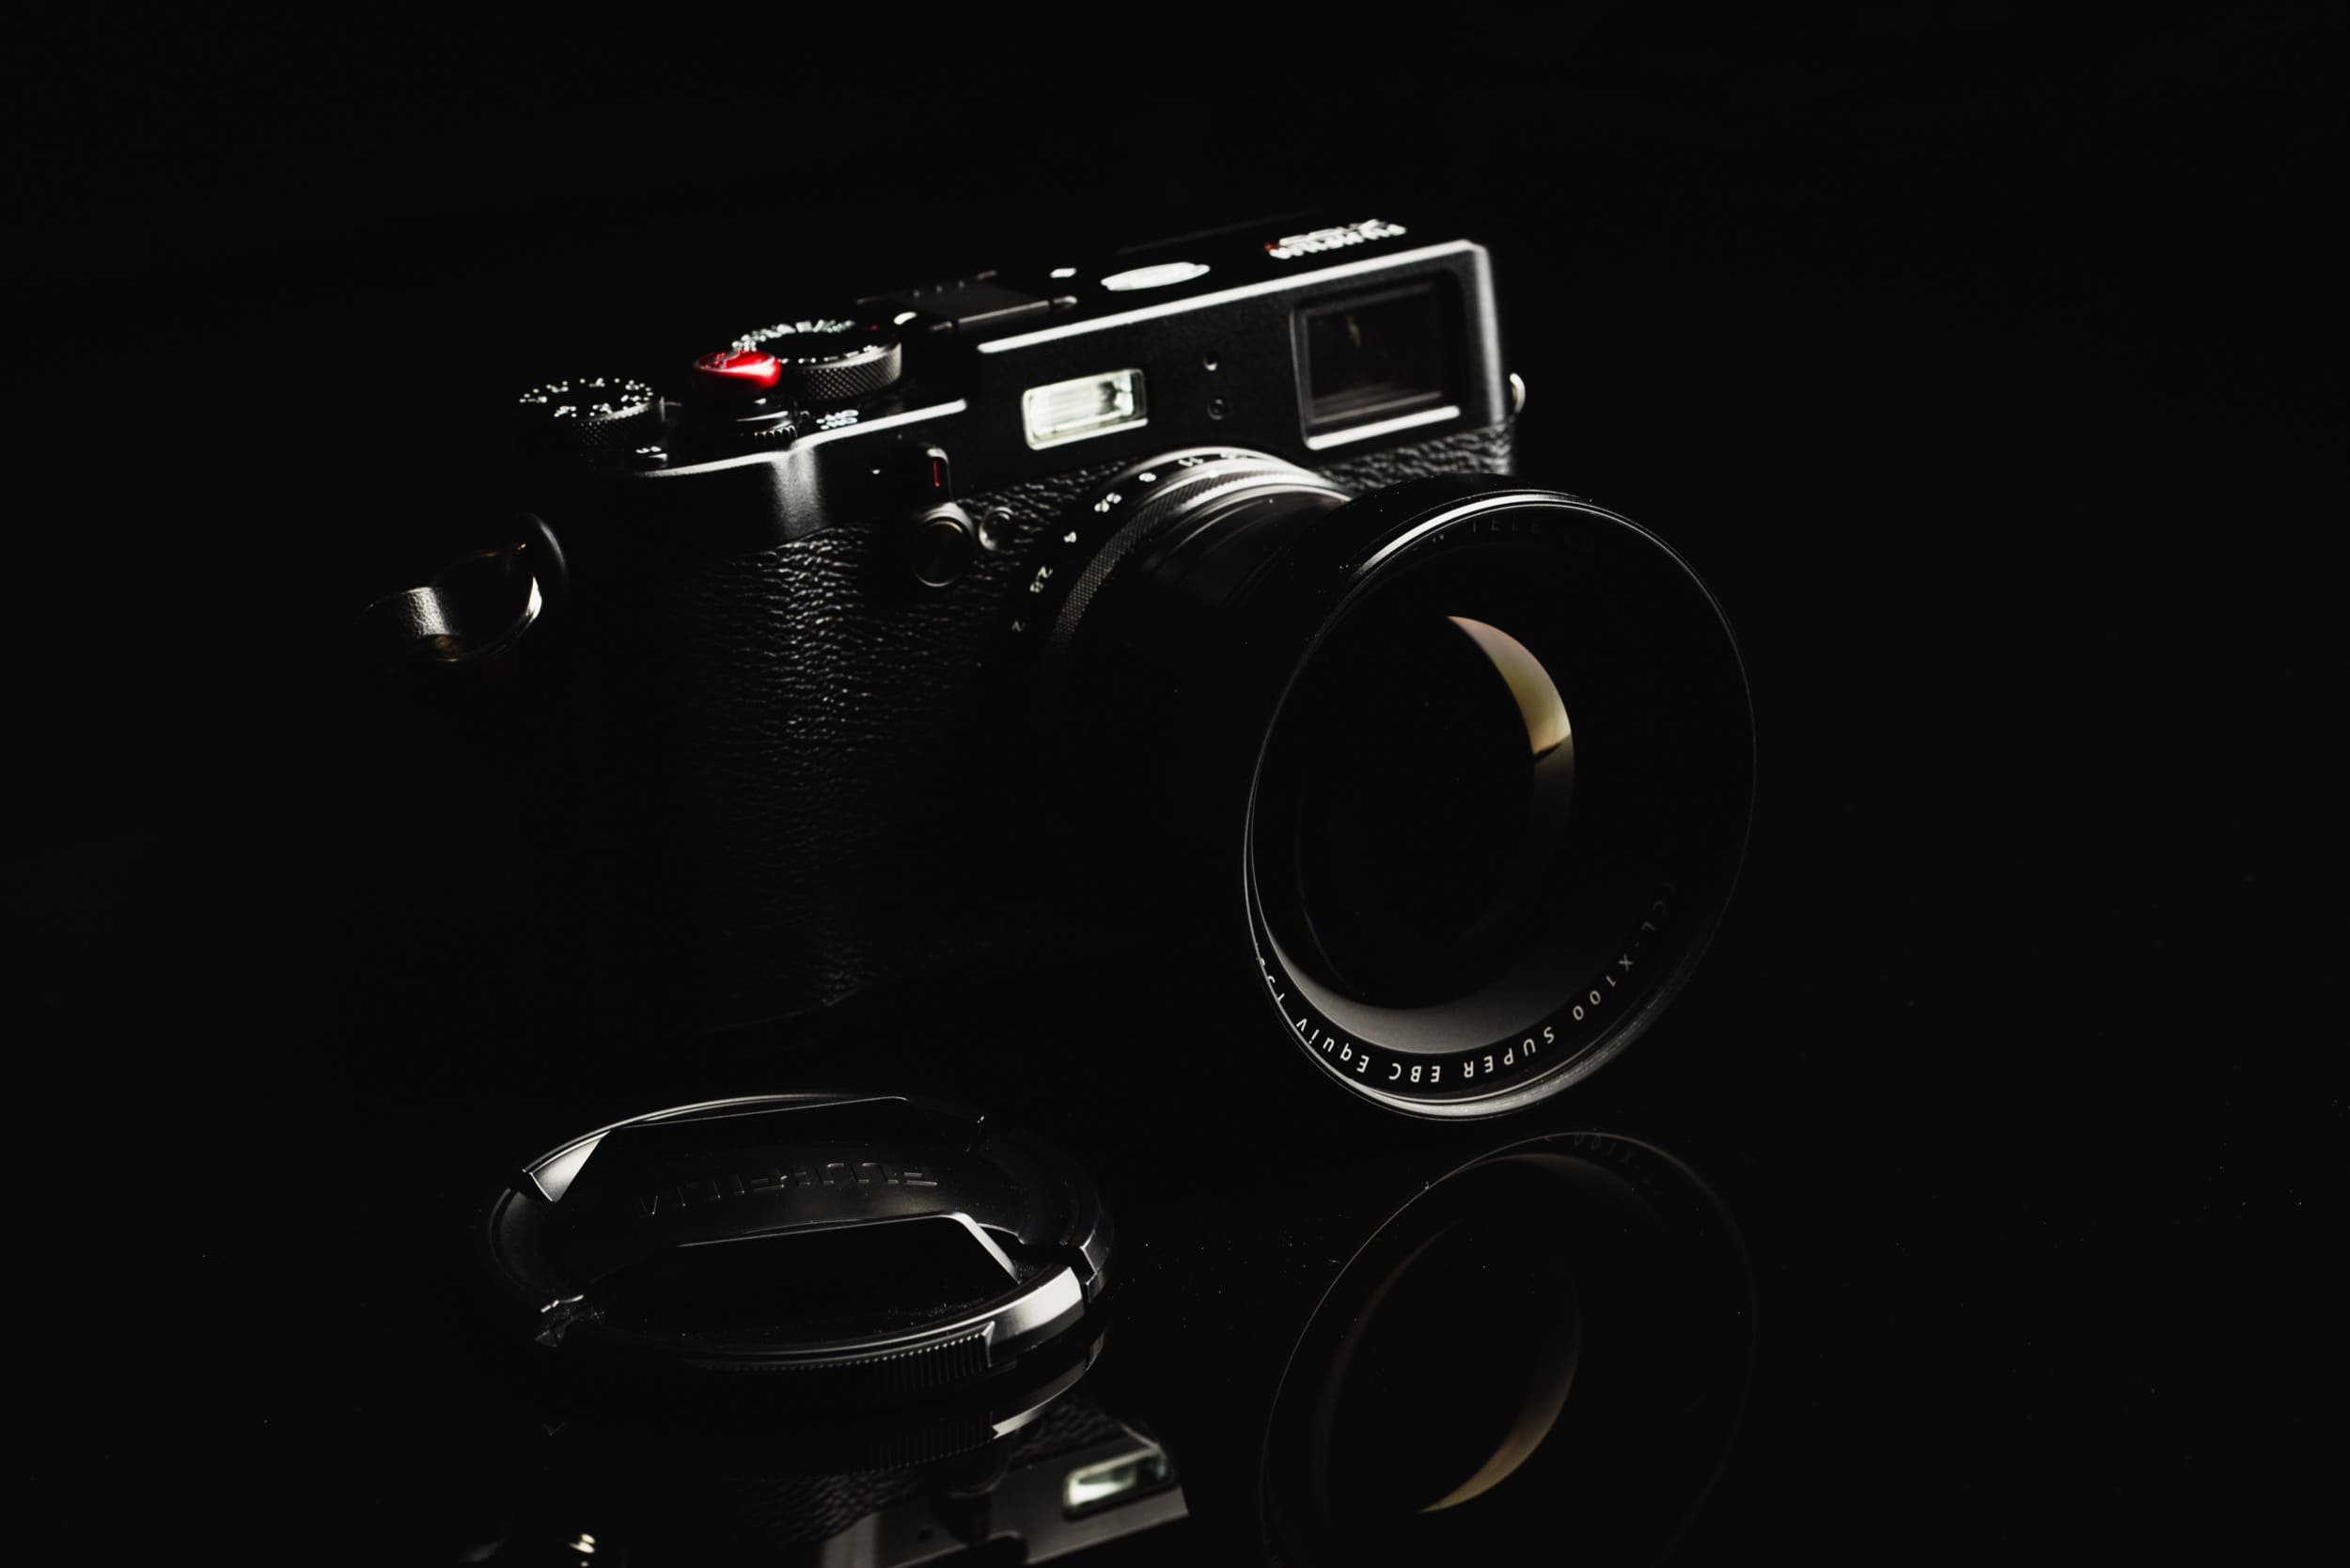 Fujifilm TCL-X100 On The X100T